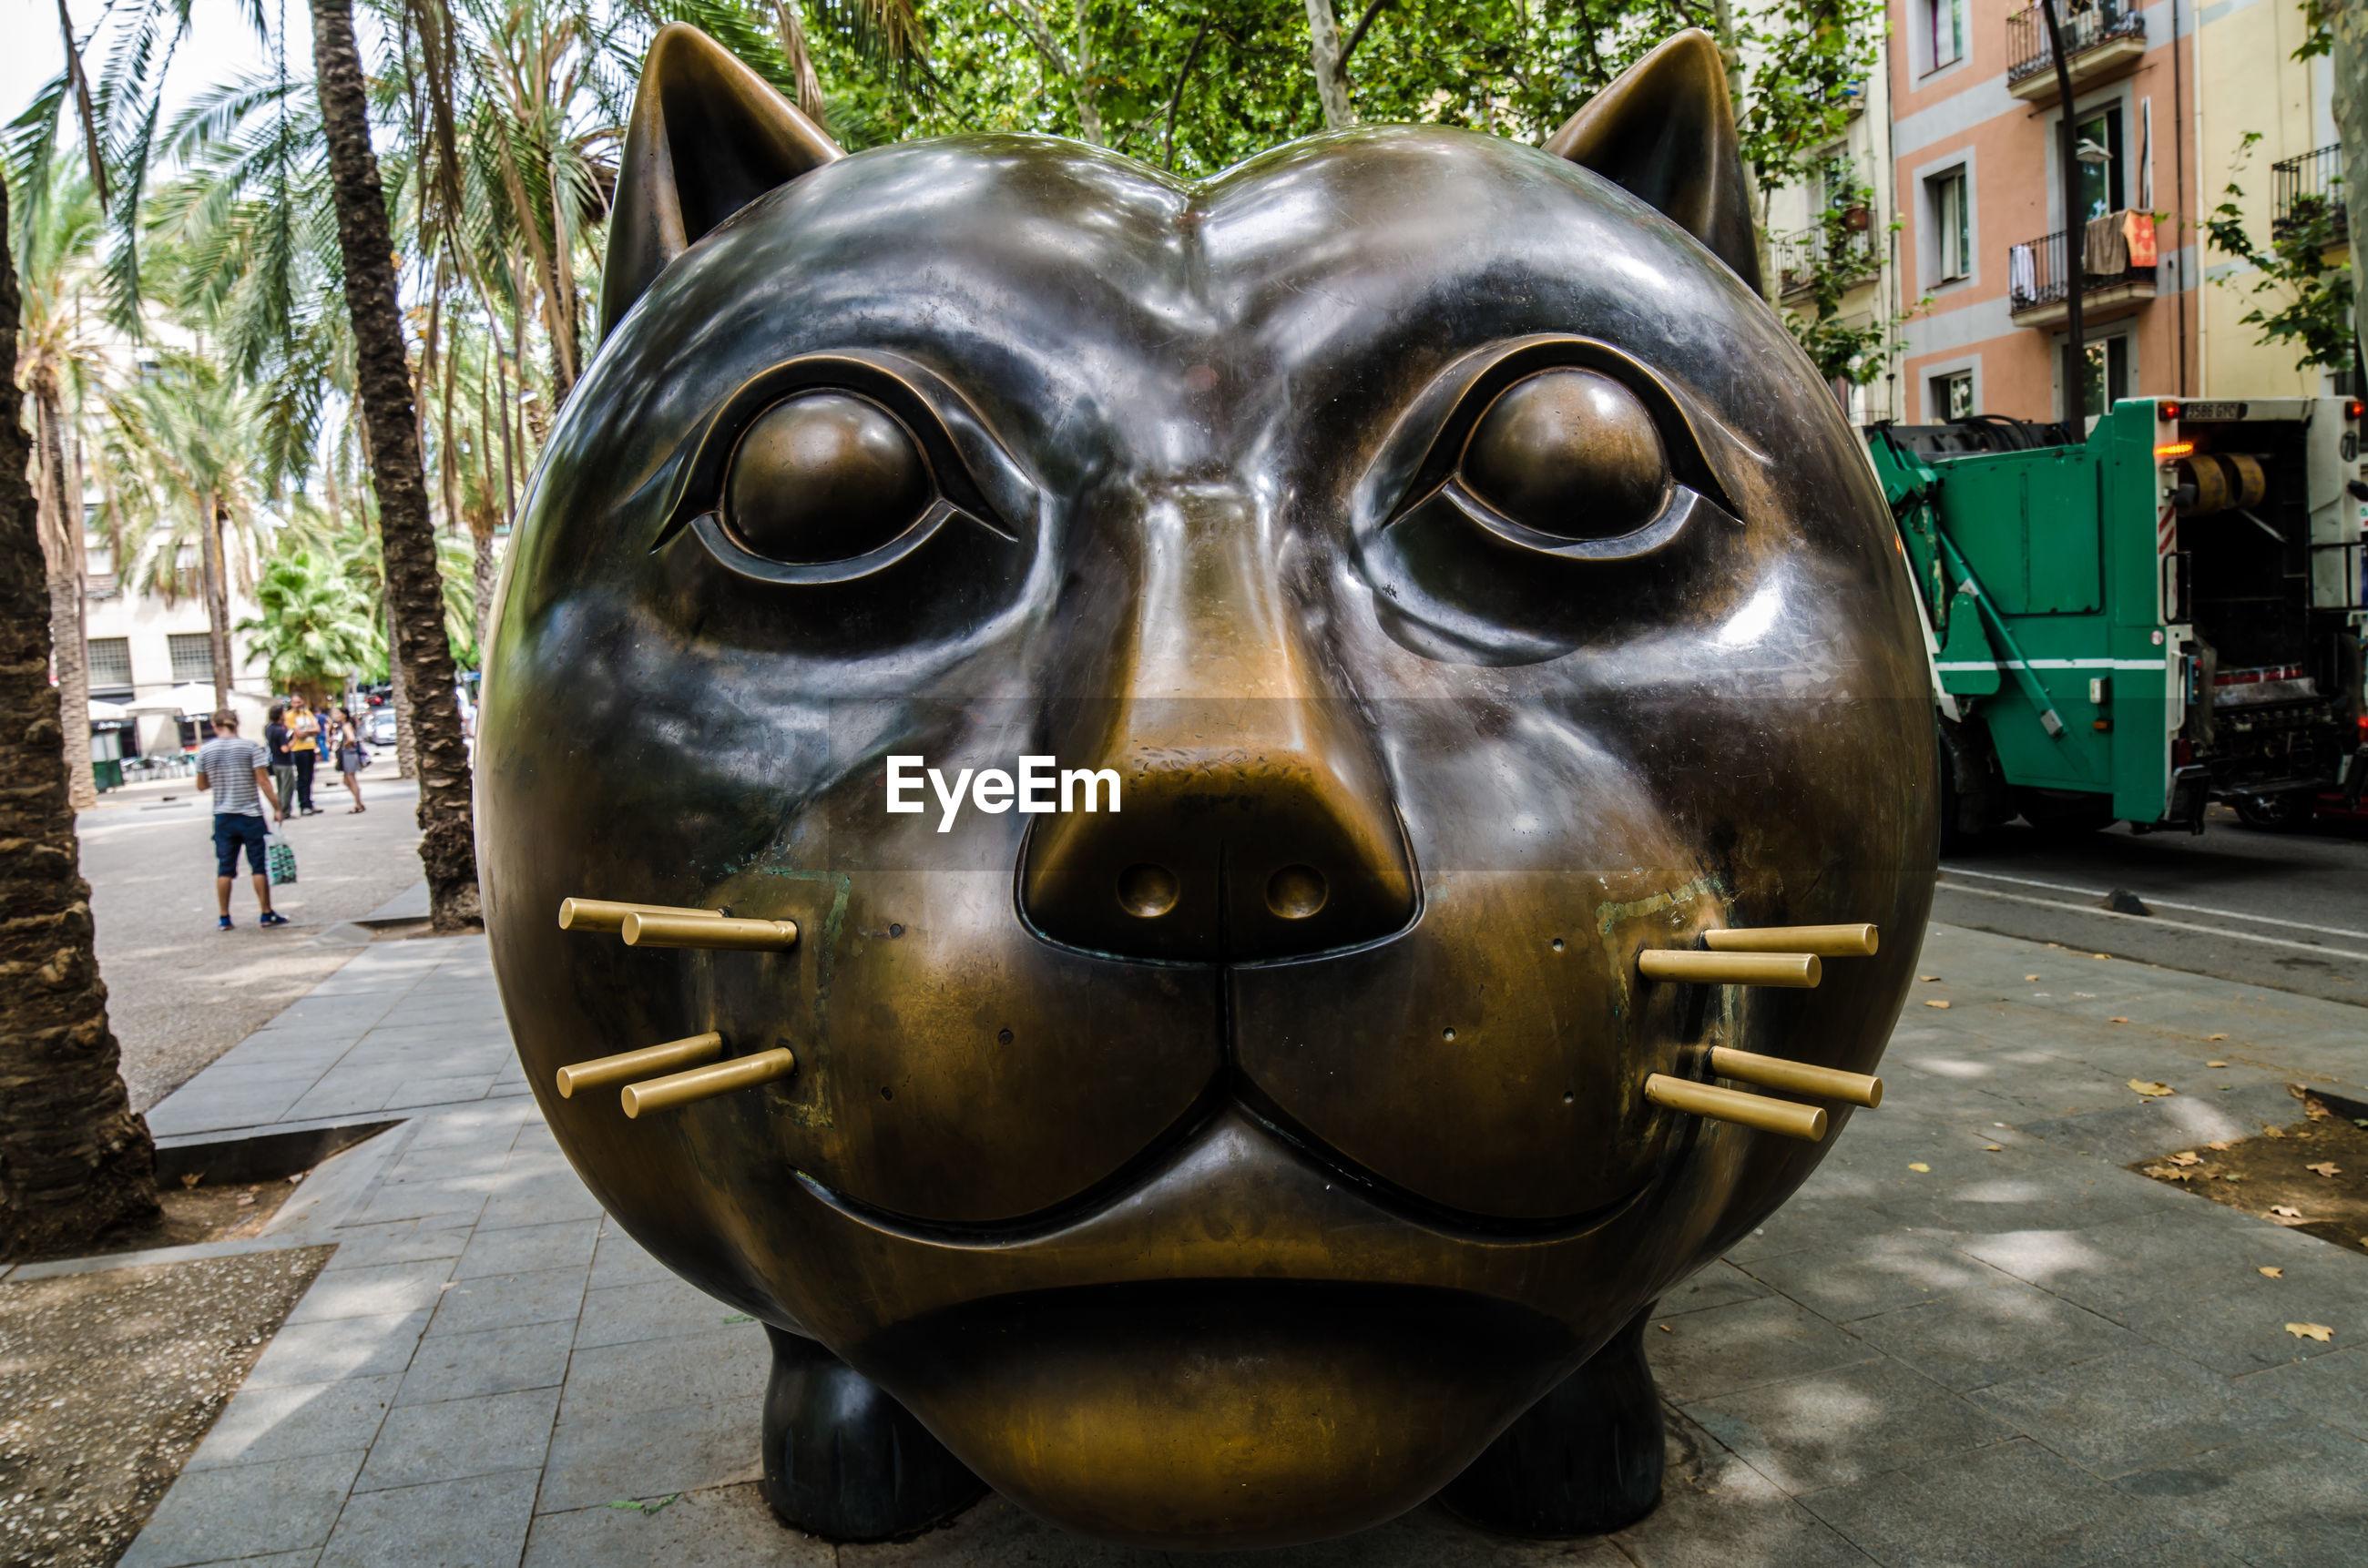 Large cat sculpture in city